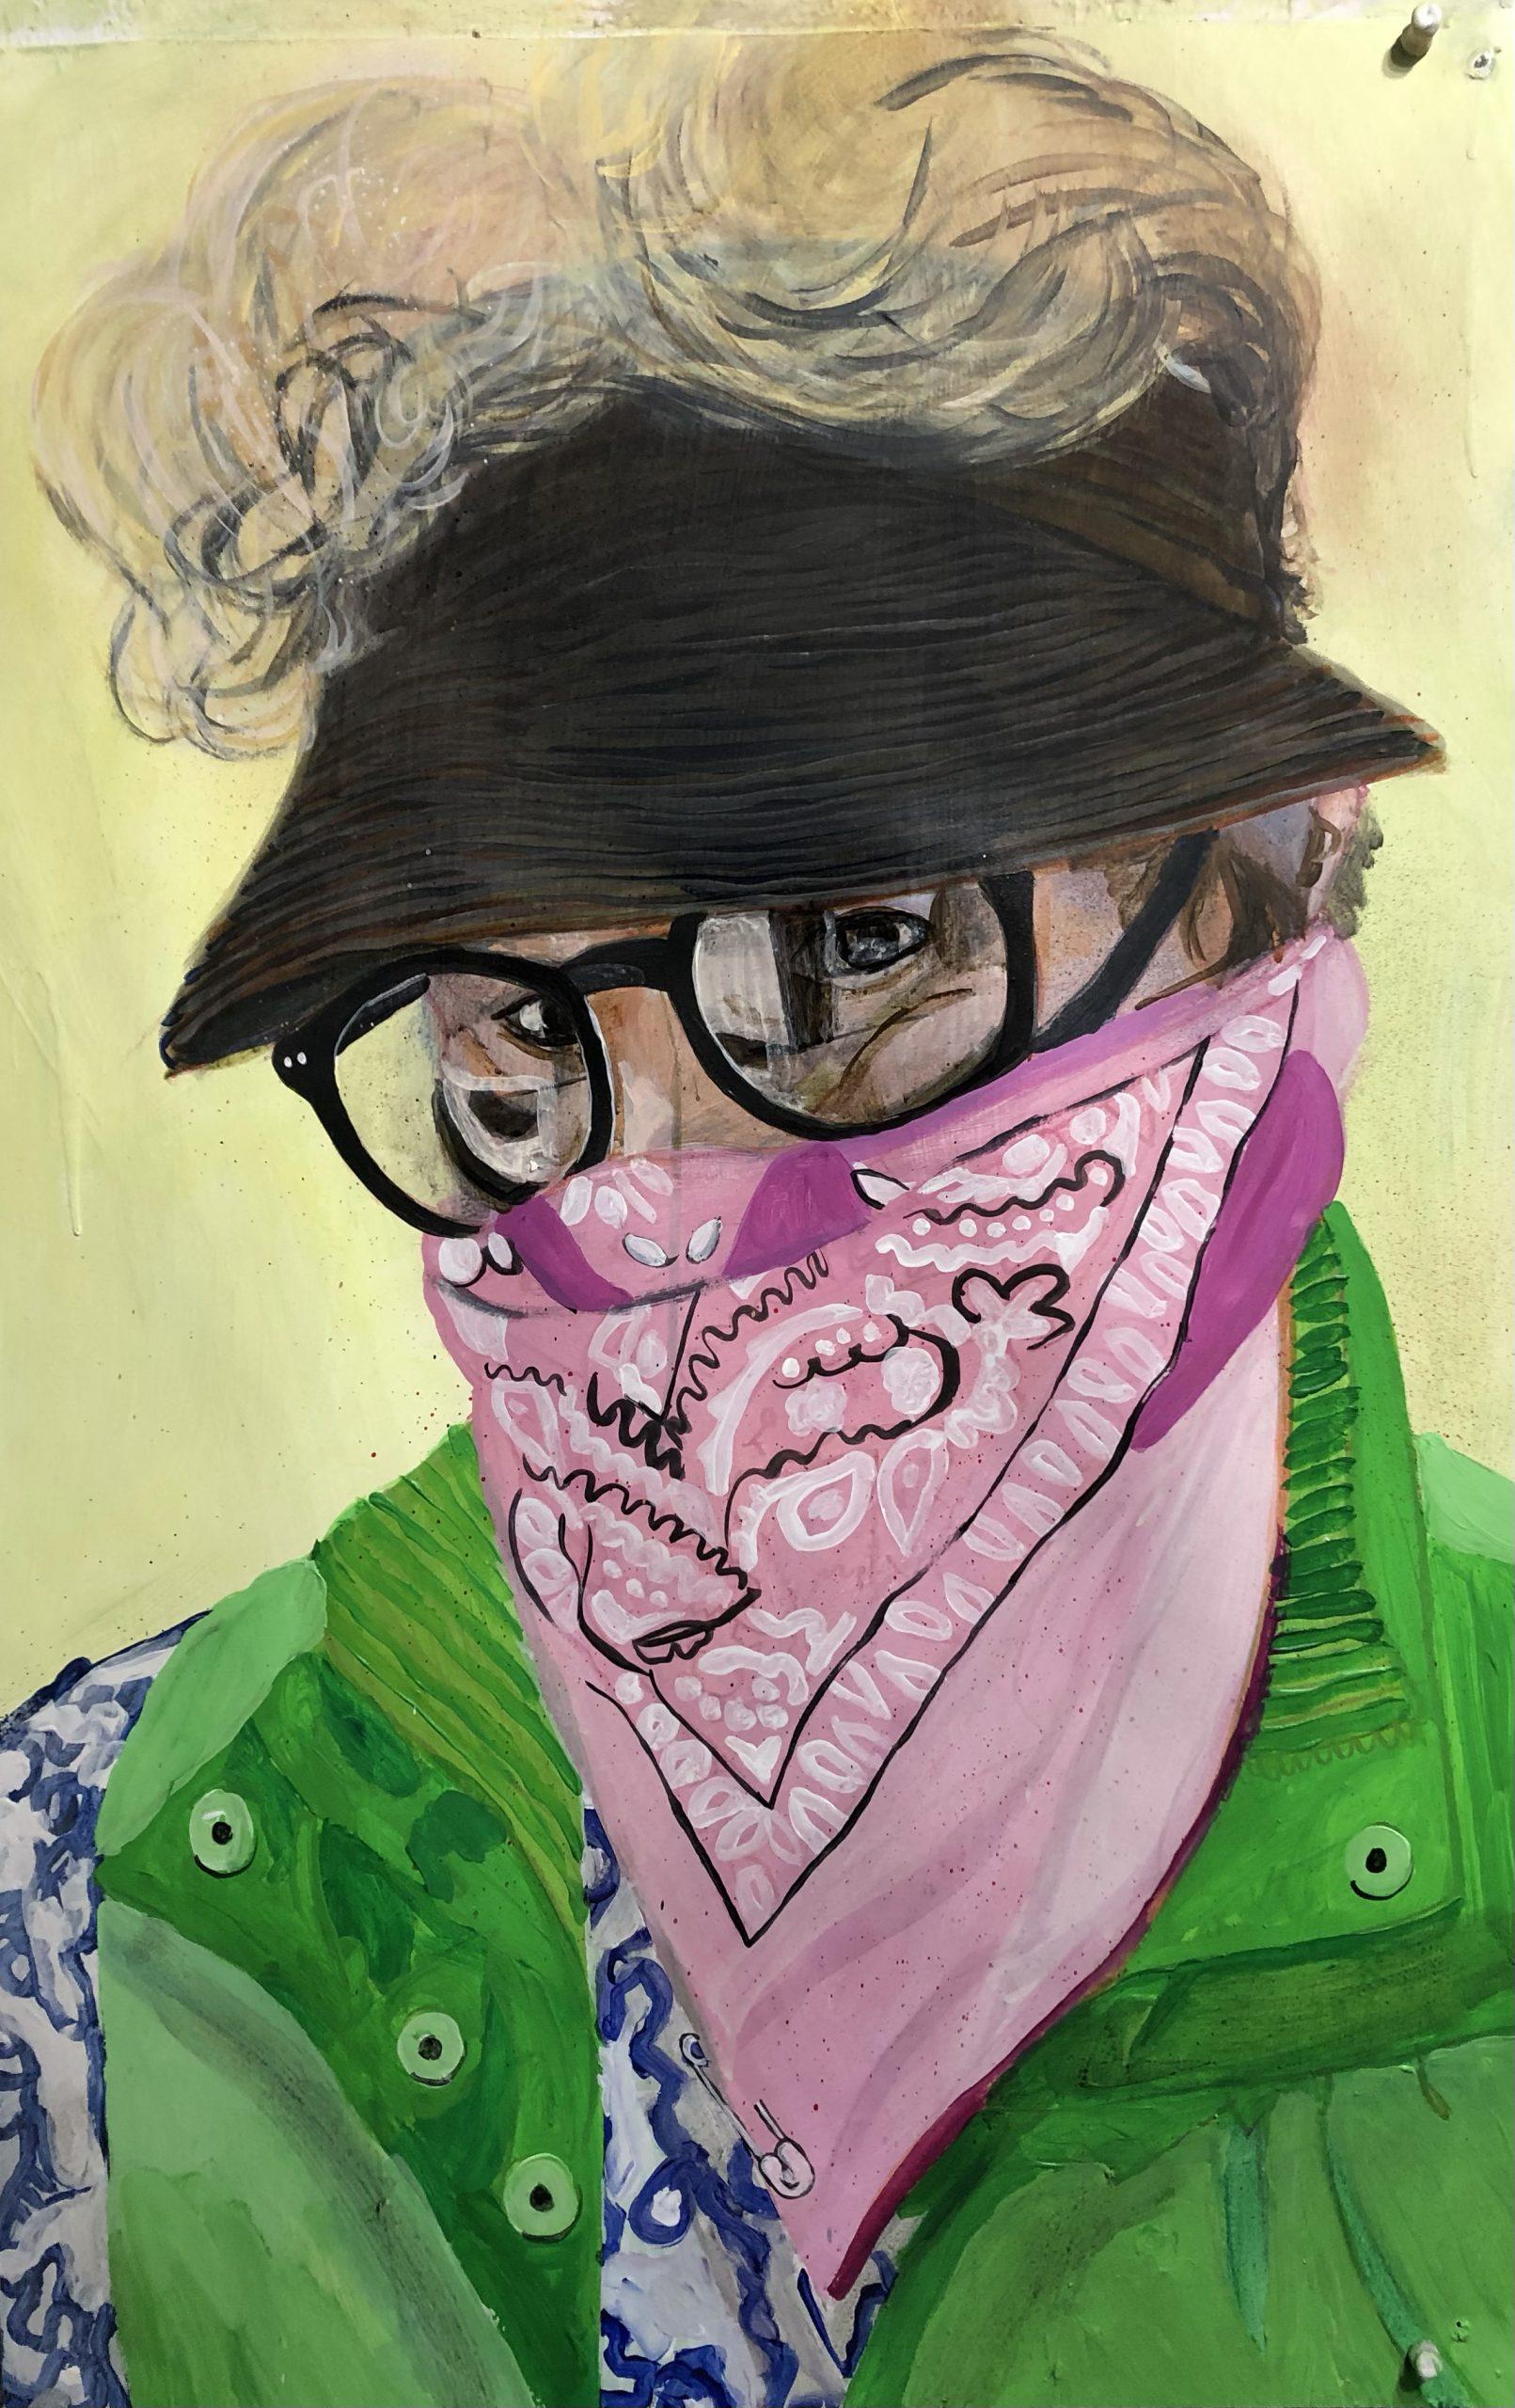 Jerri-Alyn-Curatorartist-Los-Angeles-23.5x-38